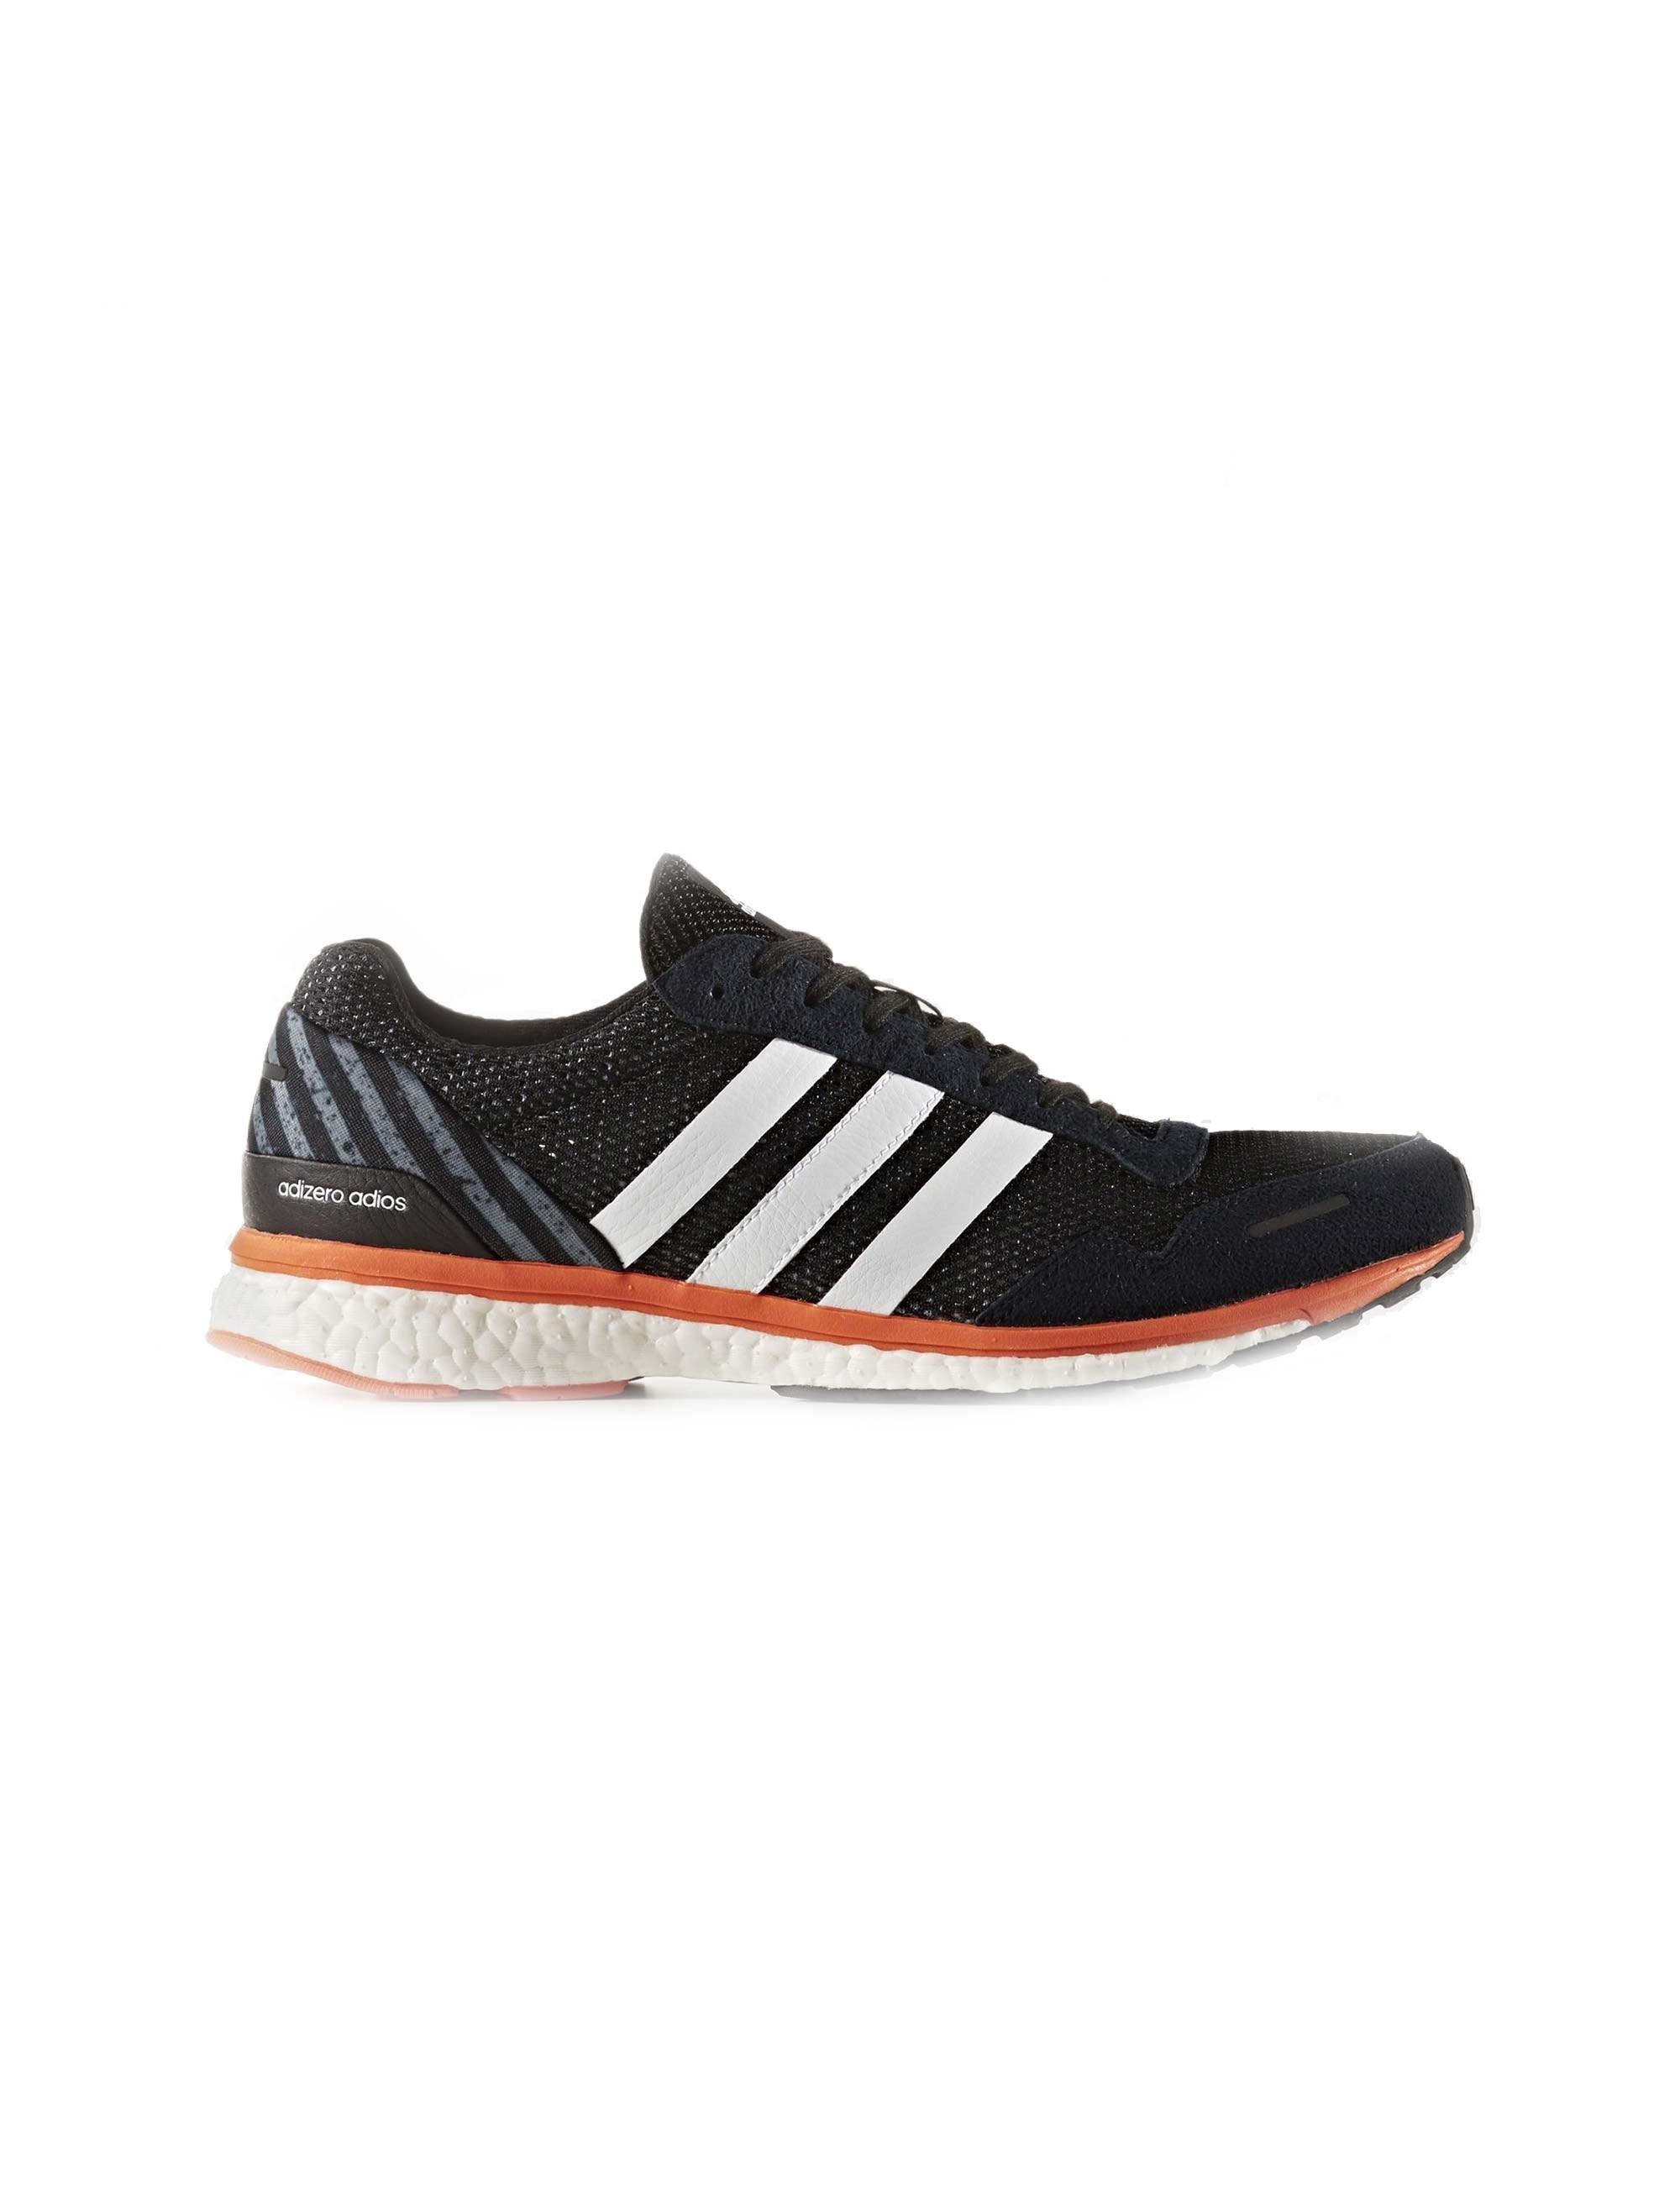 کفش دویدن بندی مردانه - آدیداس